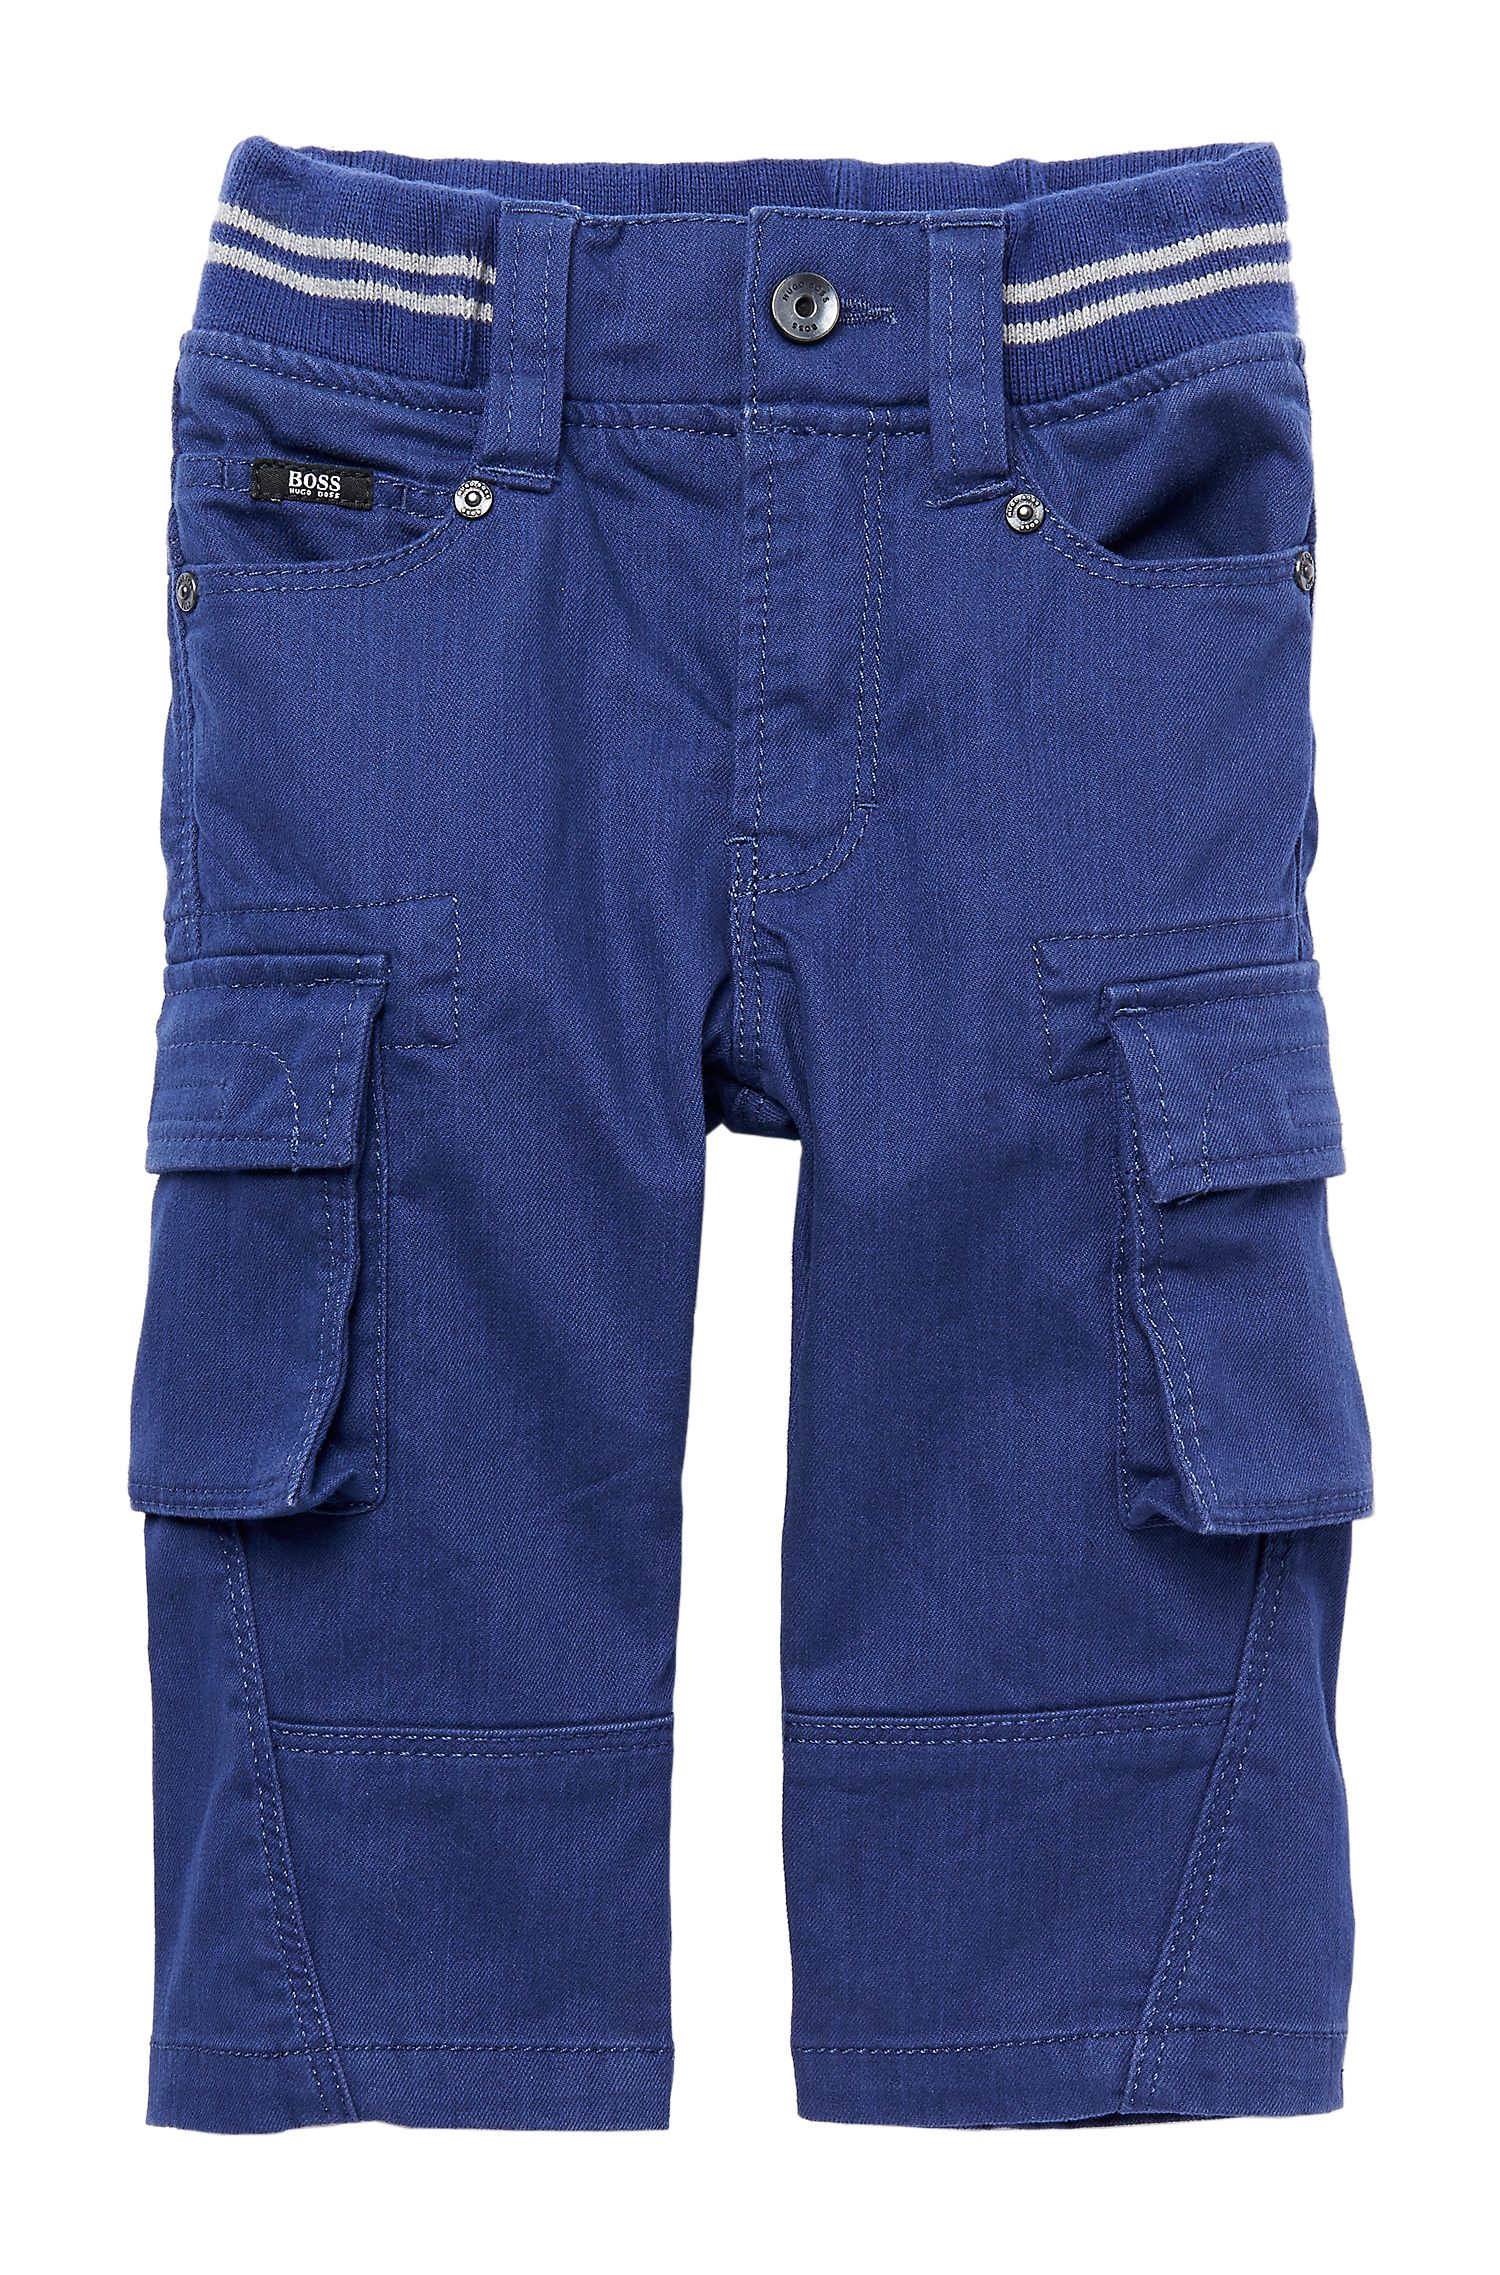 'J04128' | Toddler Stretch Cotton Cargo Chinos